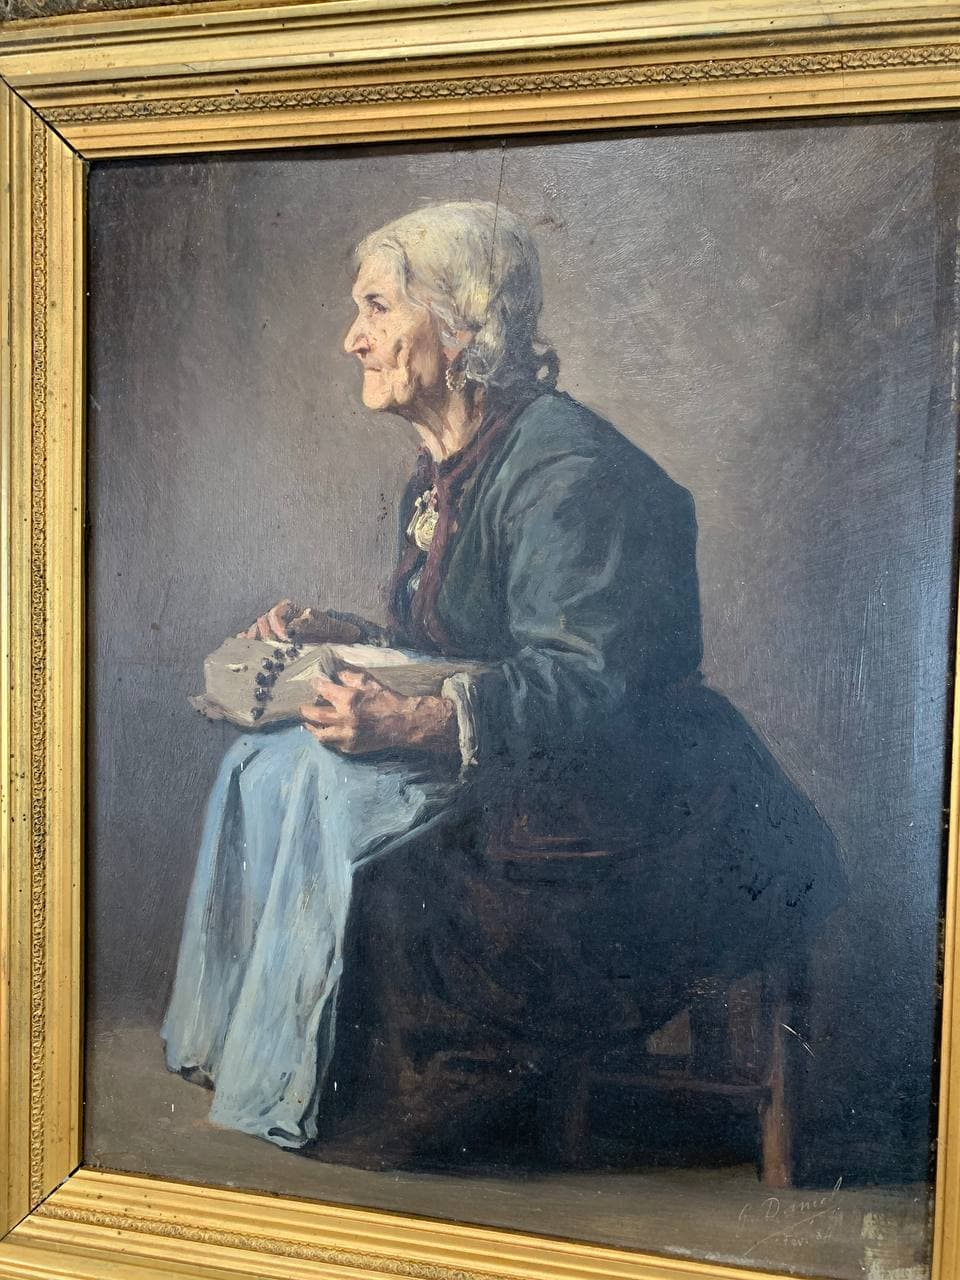 Антикварная картина второй половины XIX века